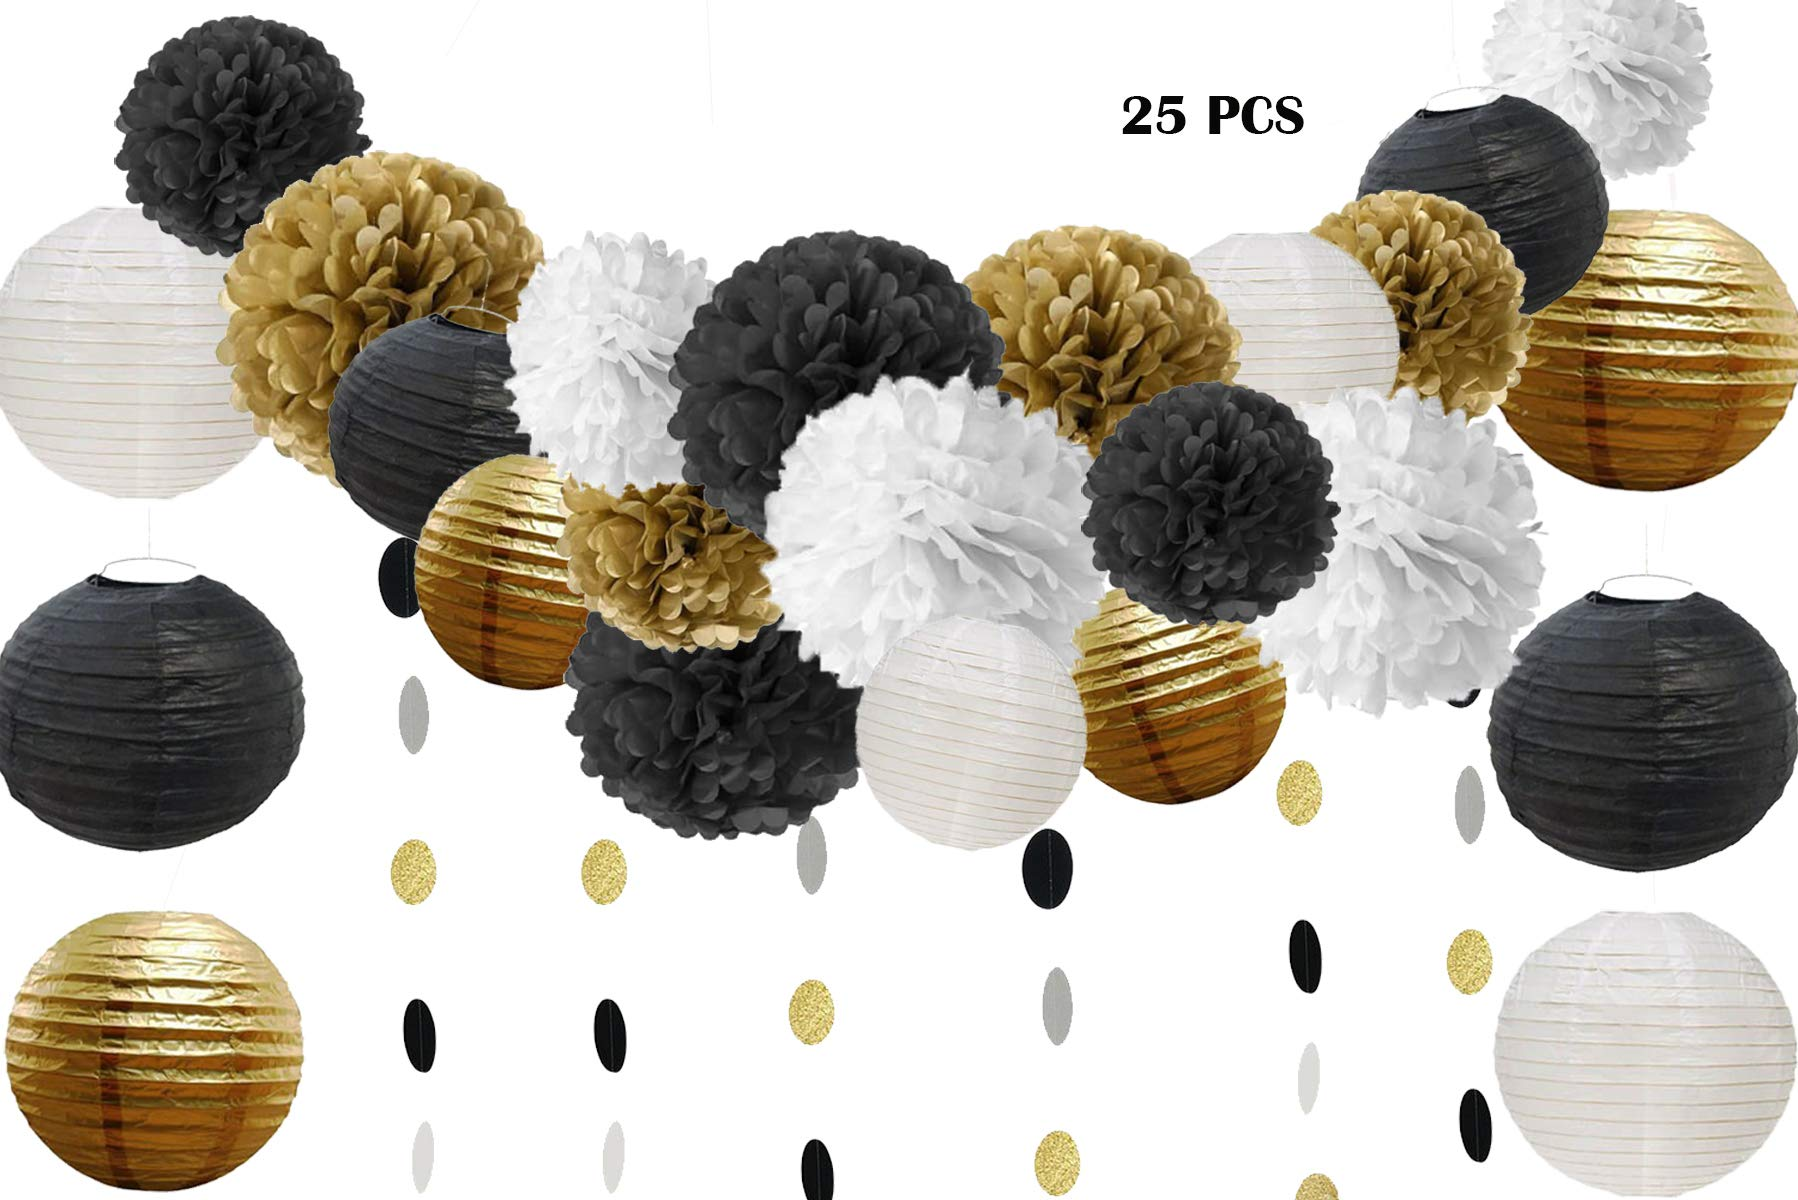 25 Pcs Black Gold White Tissue Pom Poms Paper Flowers Paper Lanterns for 40s 50s 60s 70s Birthday Party Decorations